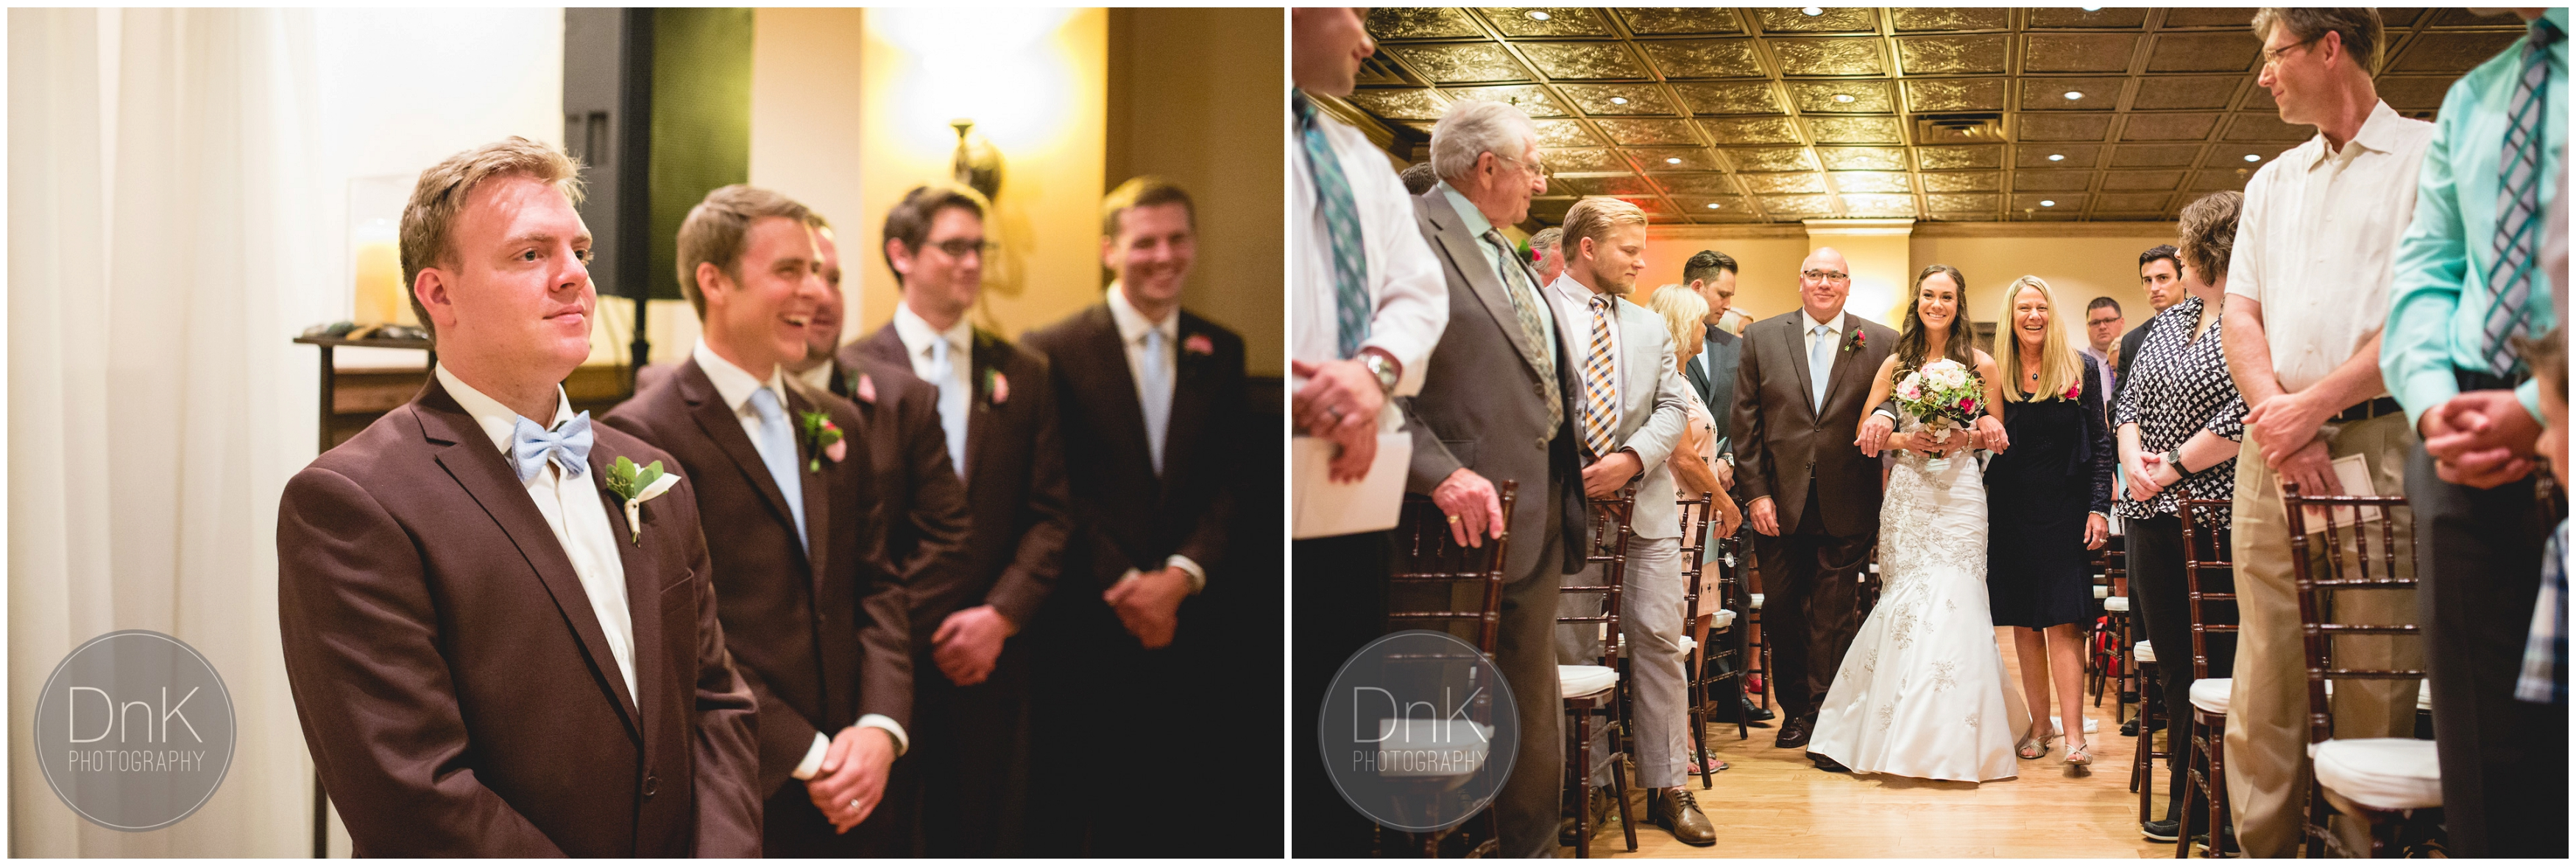 17 - 413 on Wacouta Wedding Ceremony